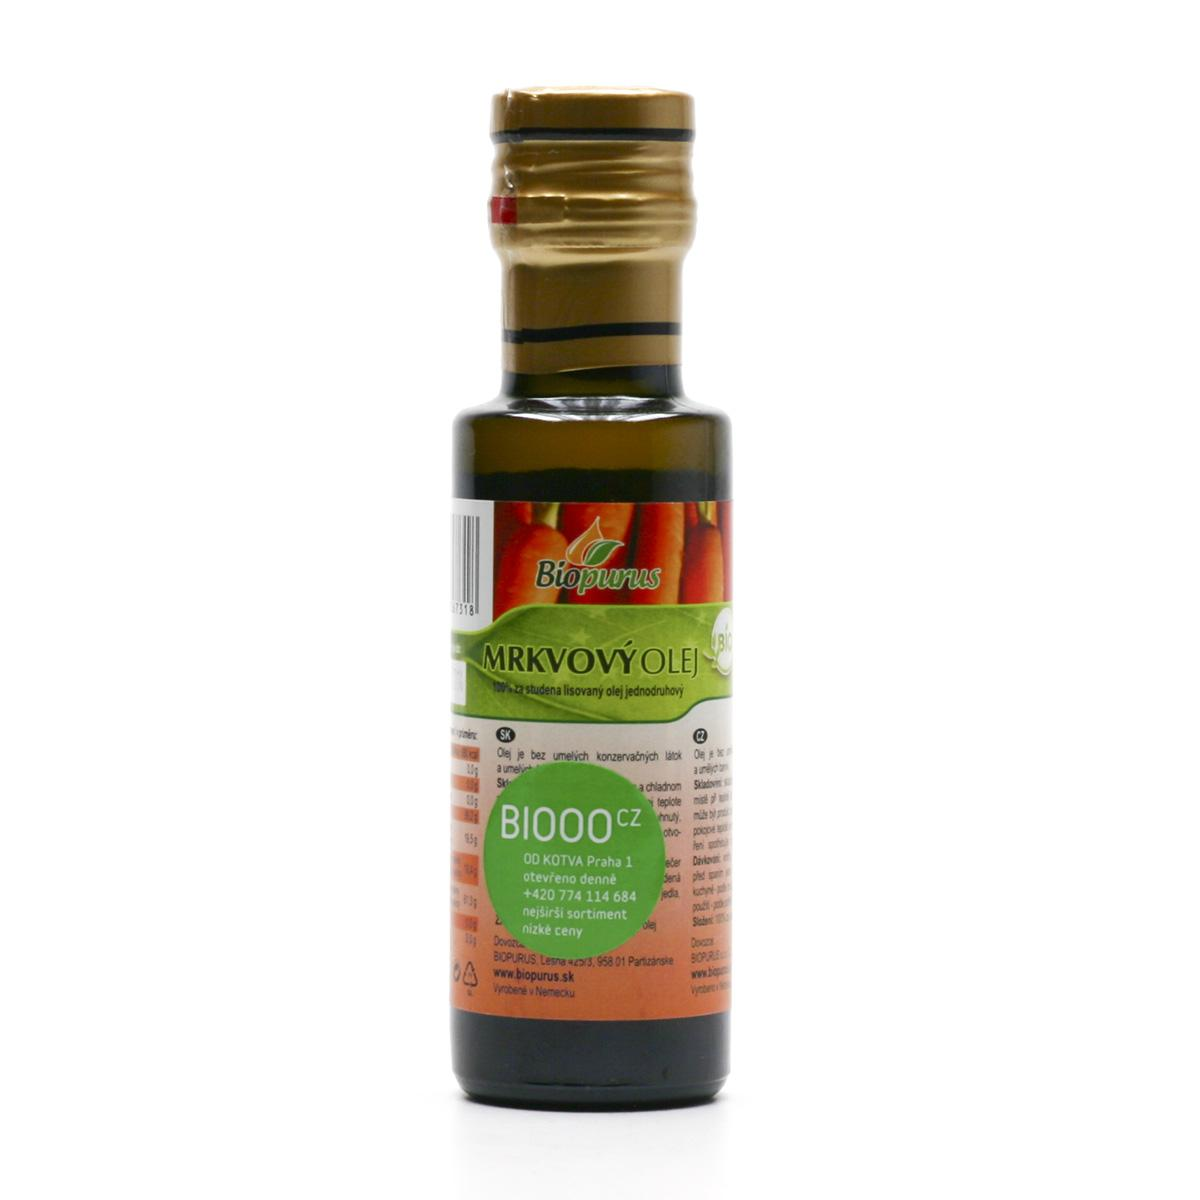 Biopurus Mrkvový olej bio 100 ml